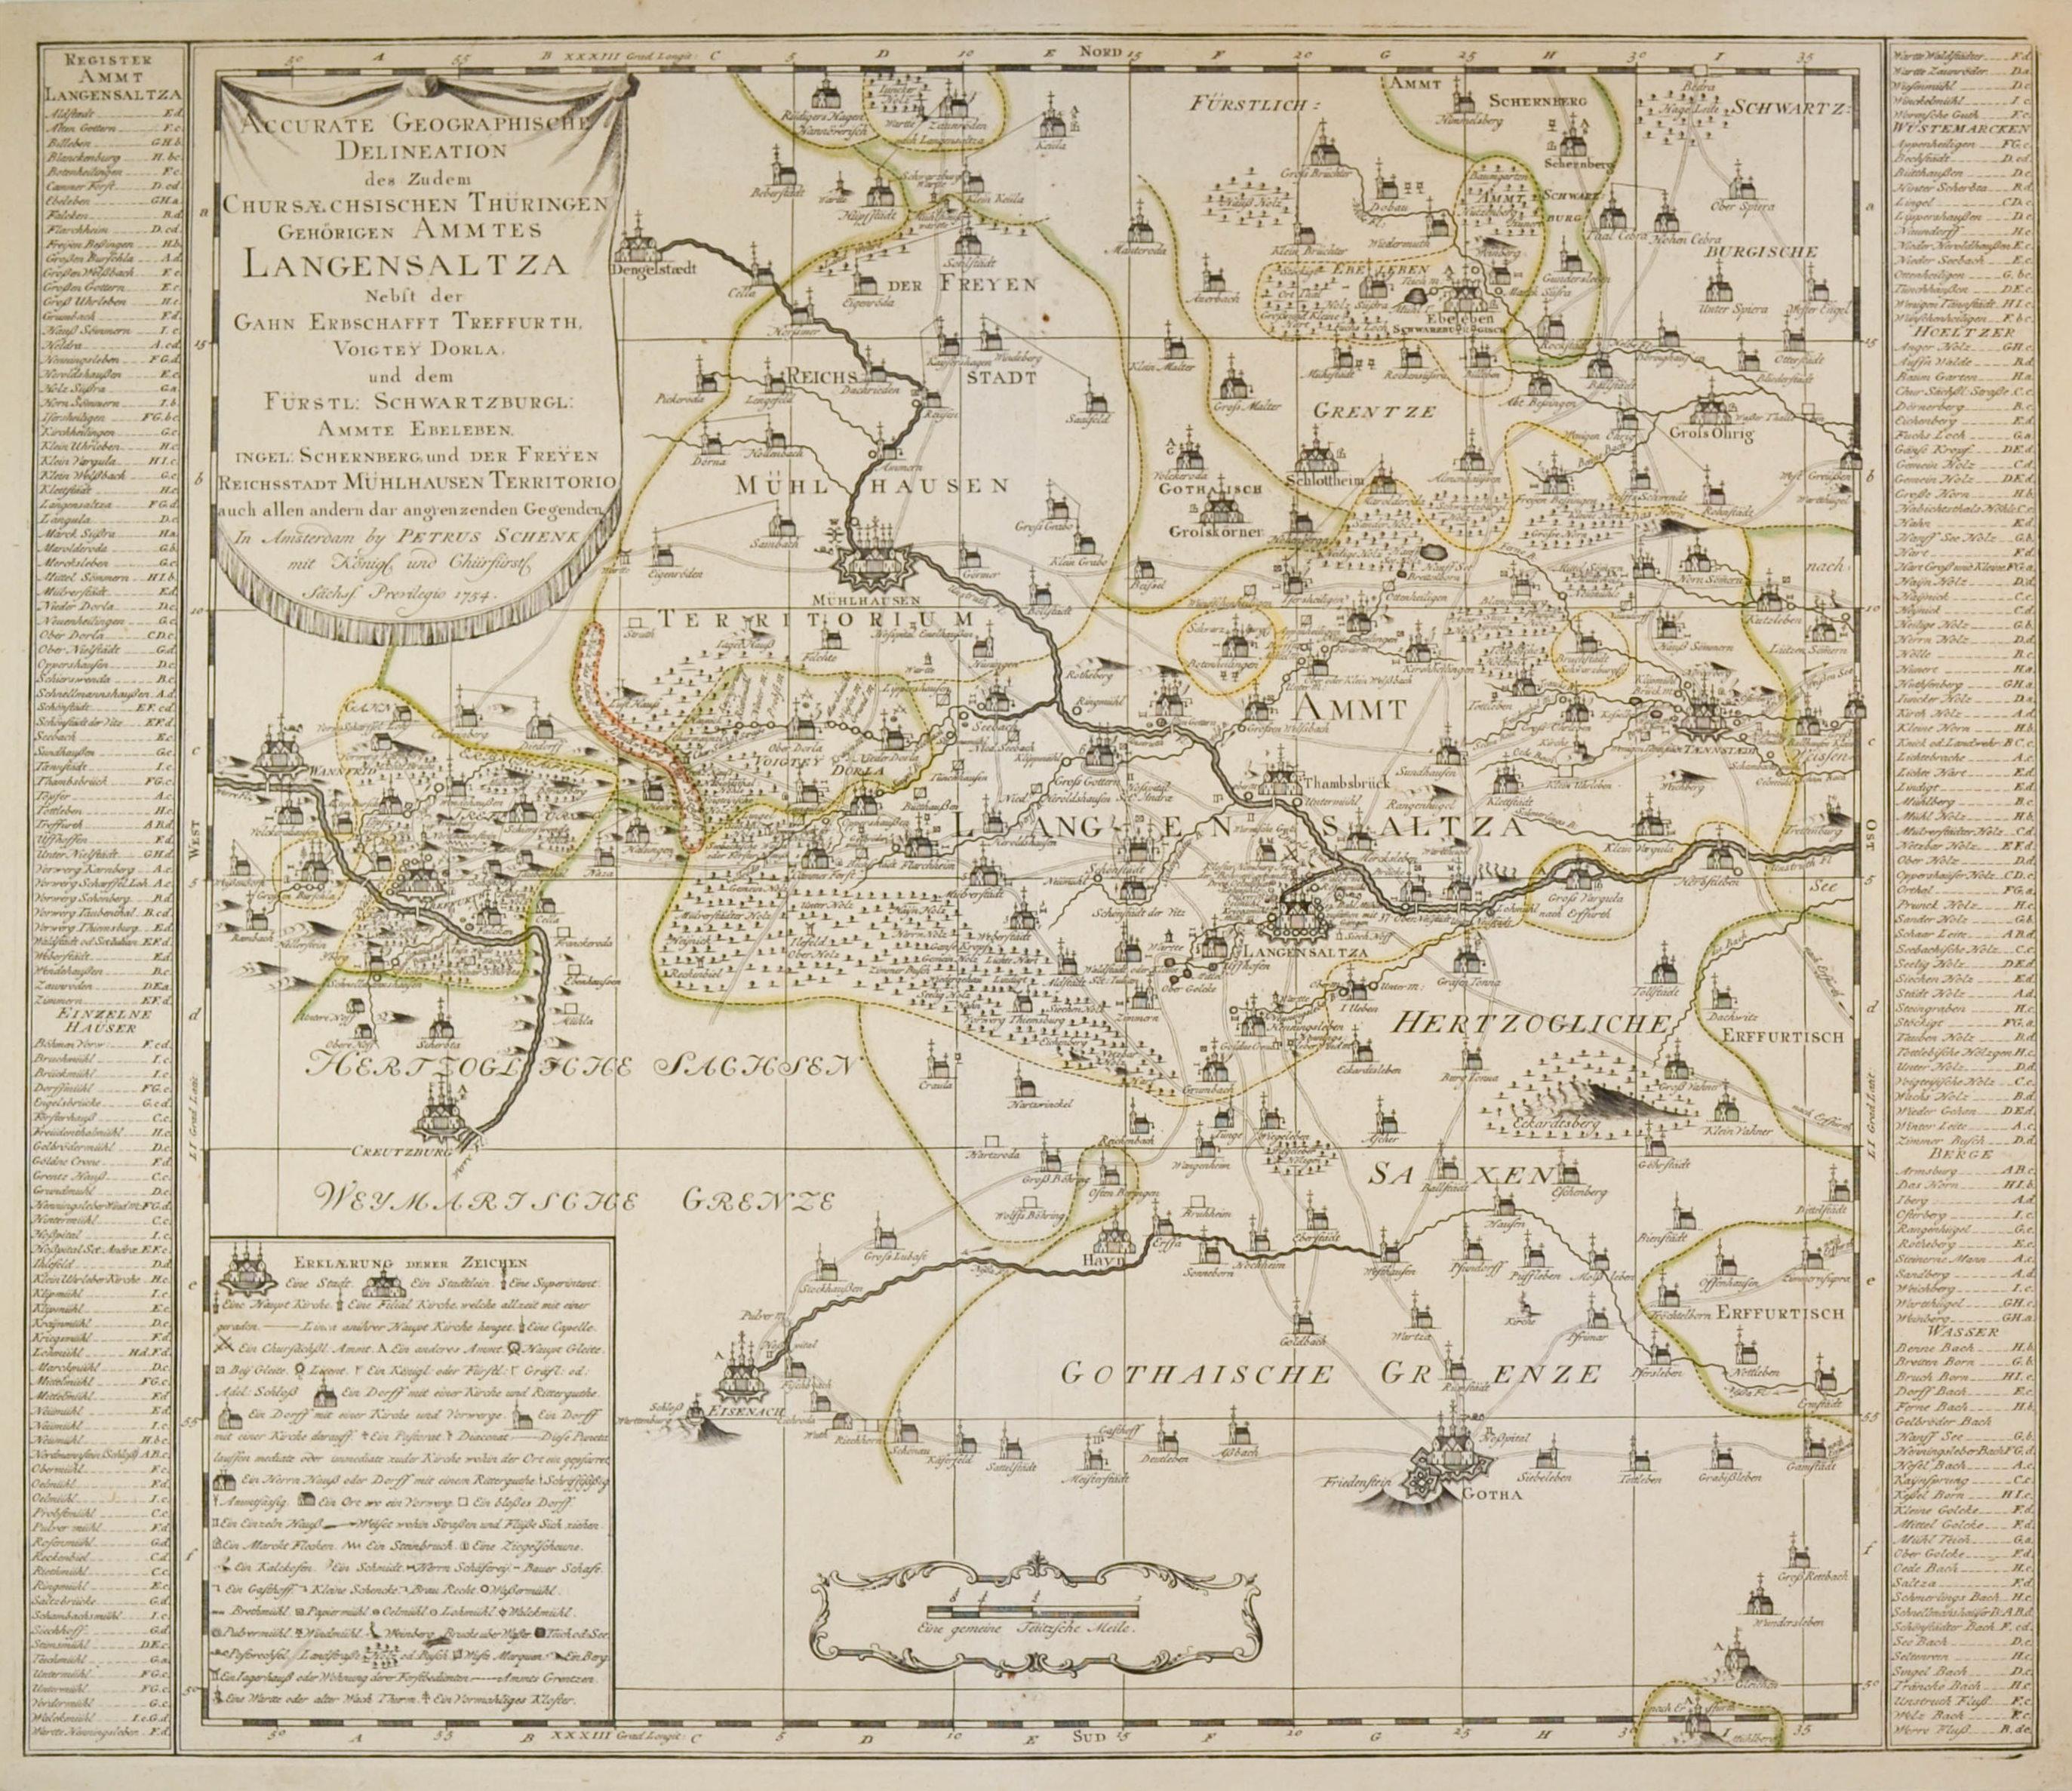 "LANGENSALZA. - Karte. ""Accurate Geographische Delineation des"